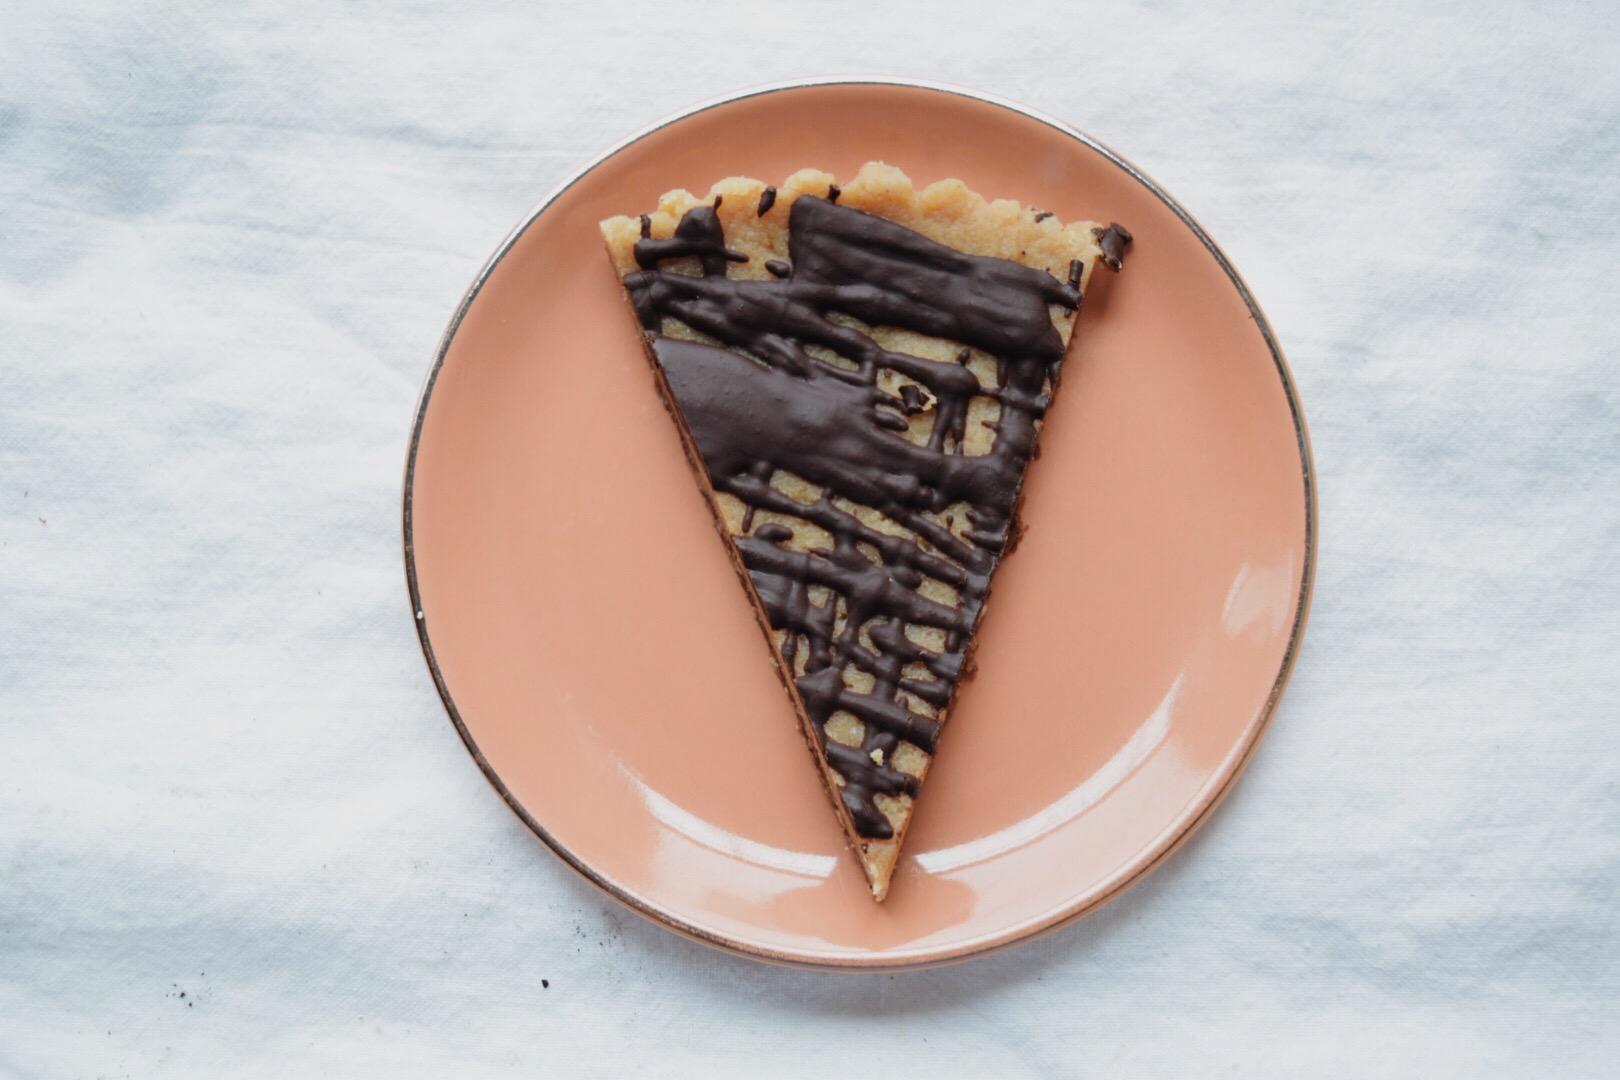 vegan + paleo peanut butter tart